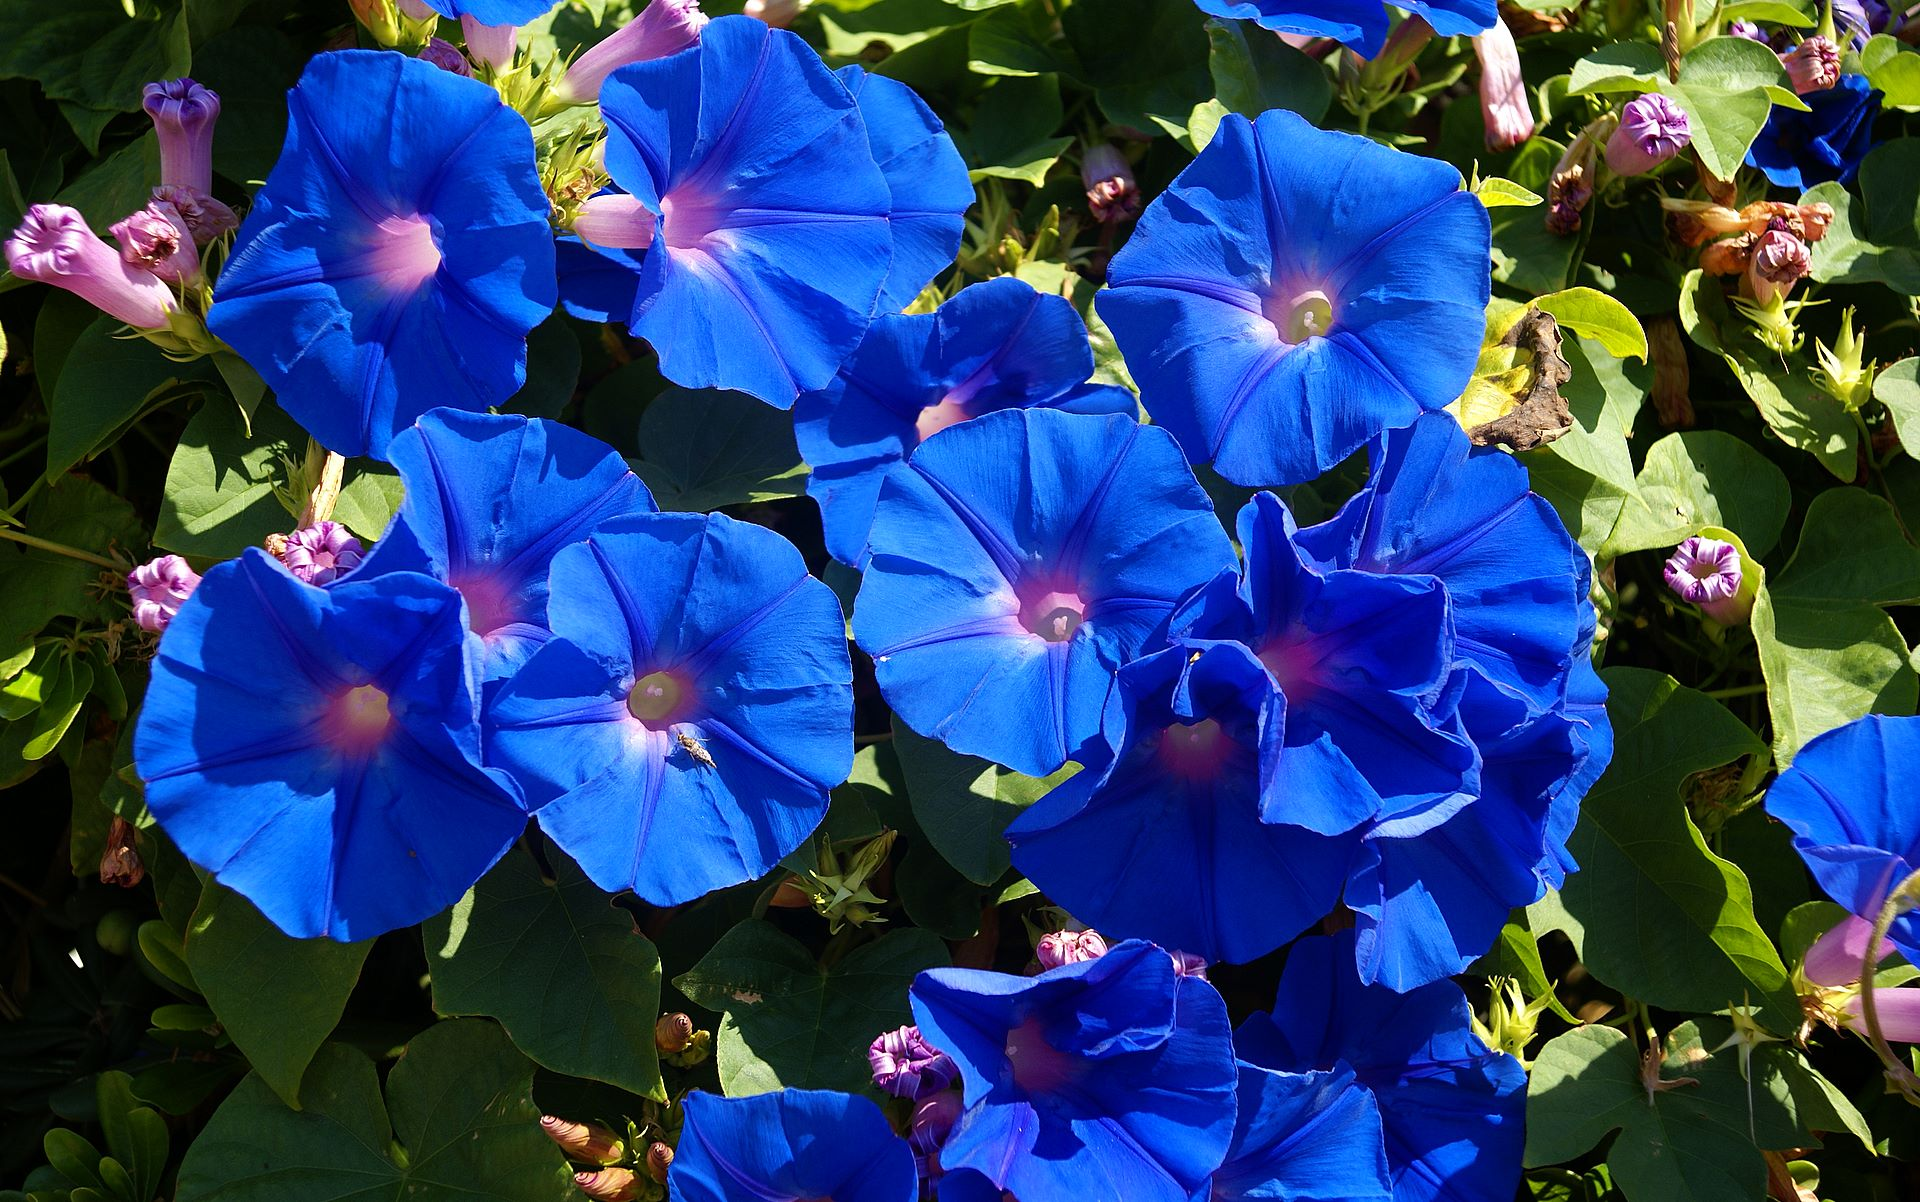 List of blue flowers names 1 free hd wallpaper hdflowerwallpaper list of blue flowers names widescreen wallpaper izmirmasajfo Gallery